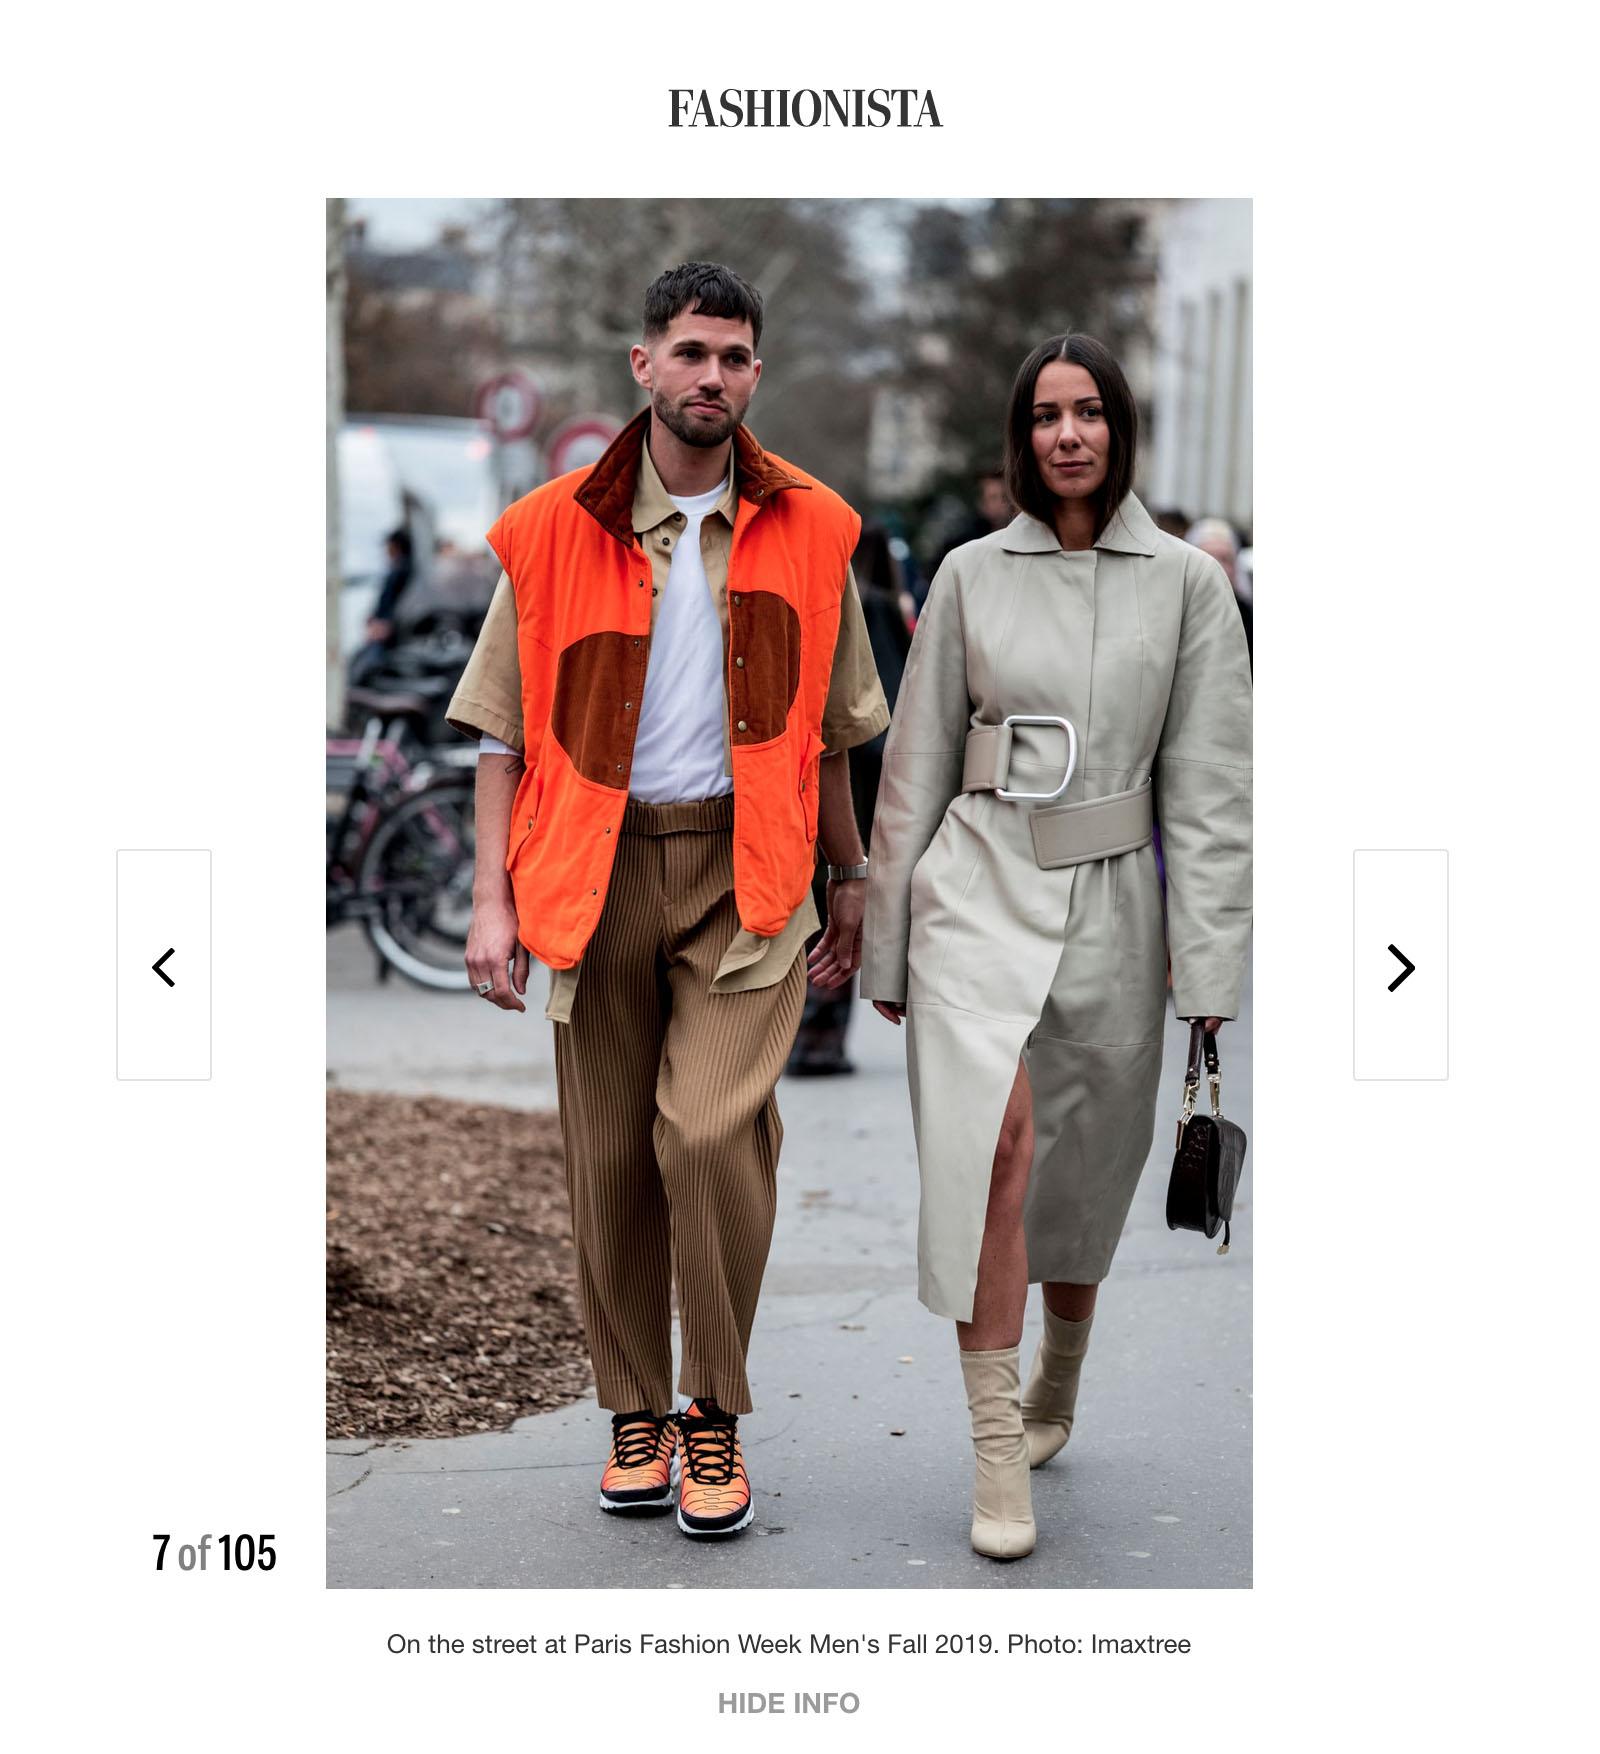 street style fashionista couple